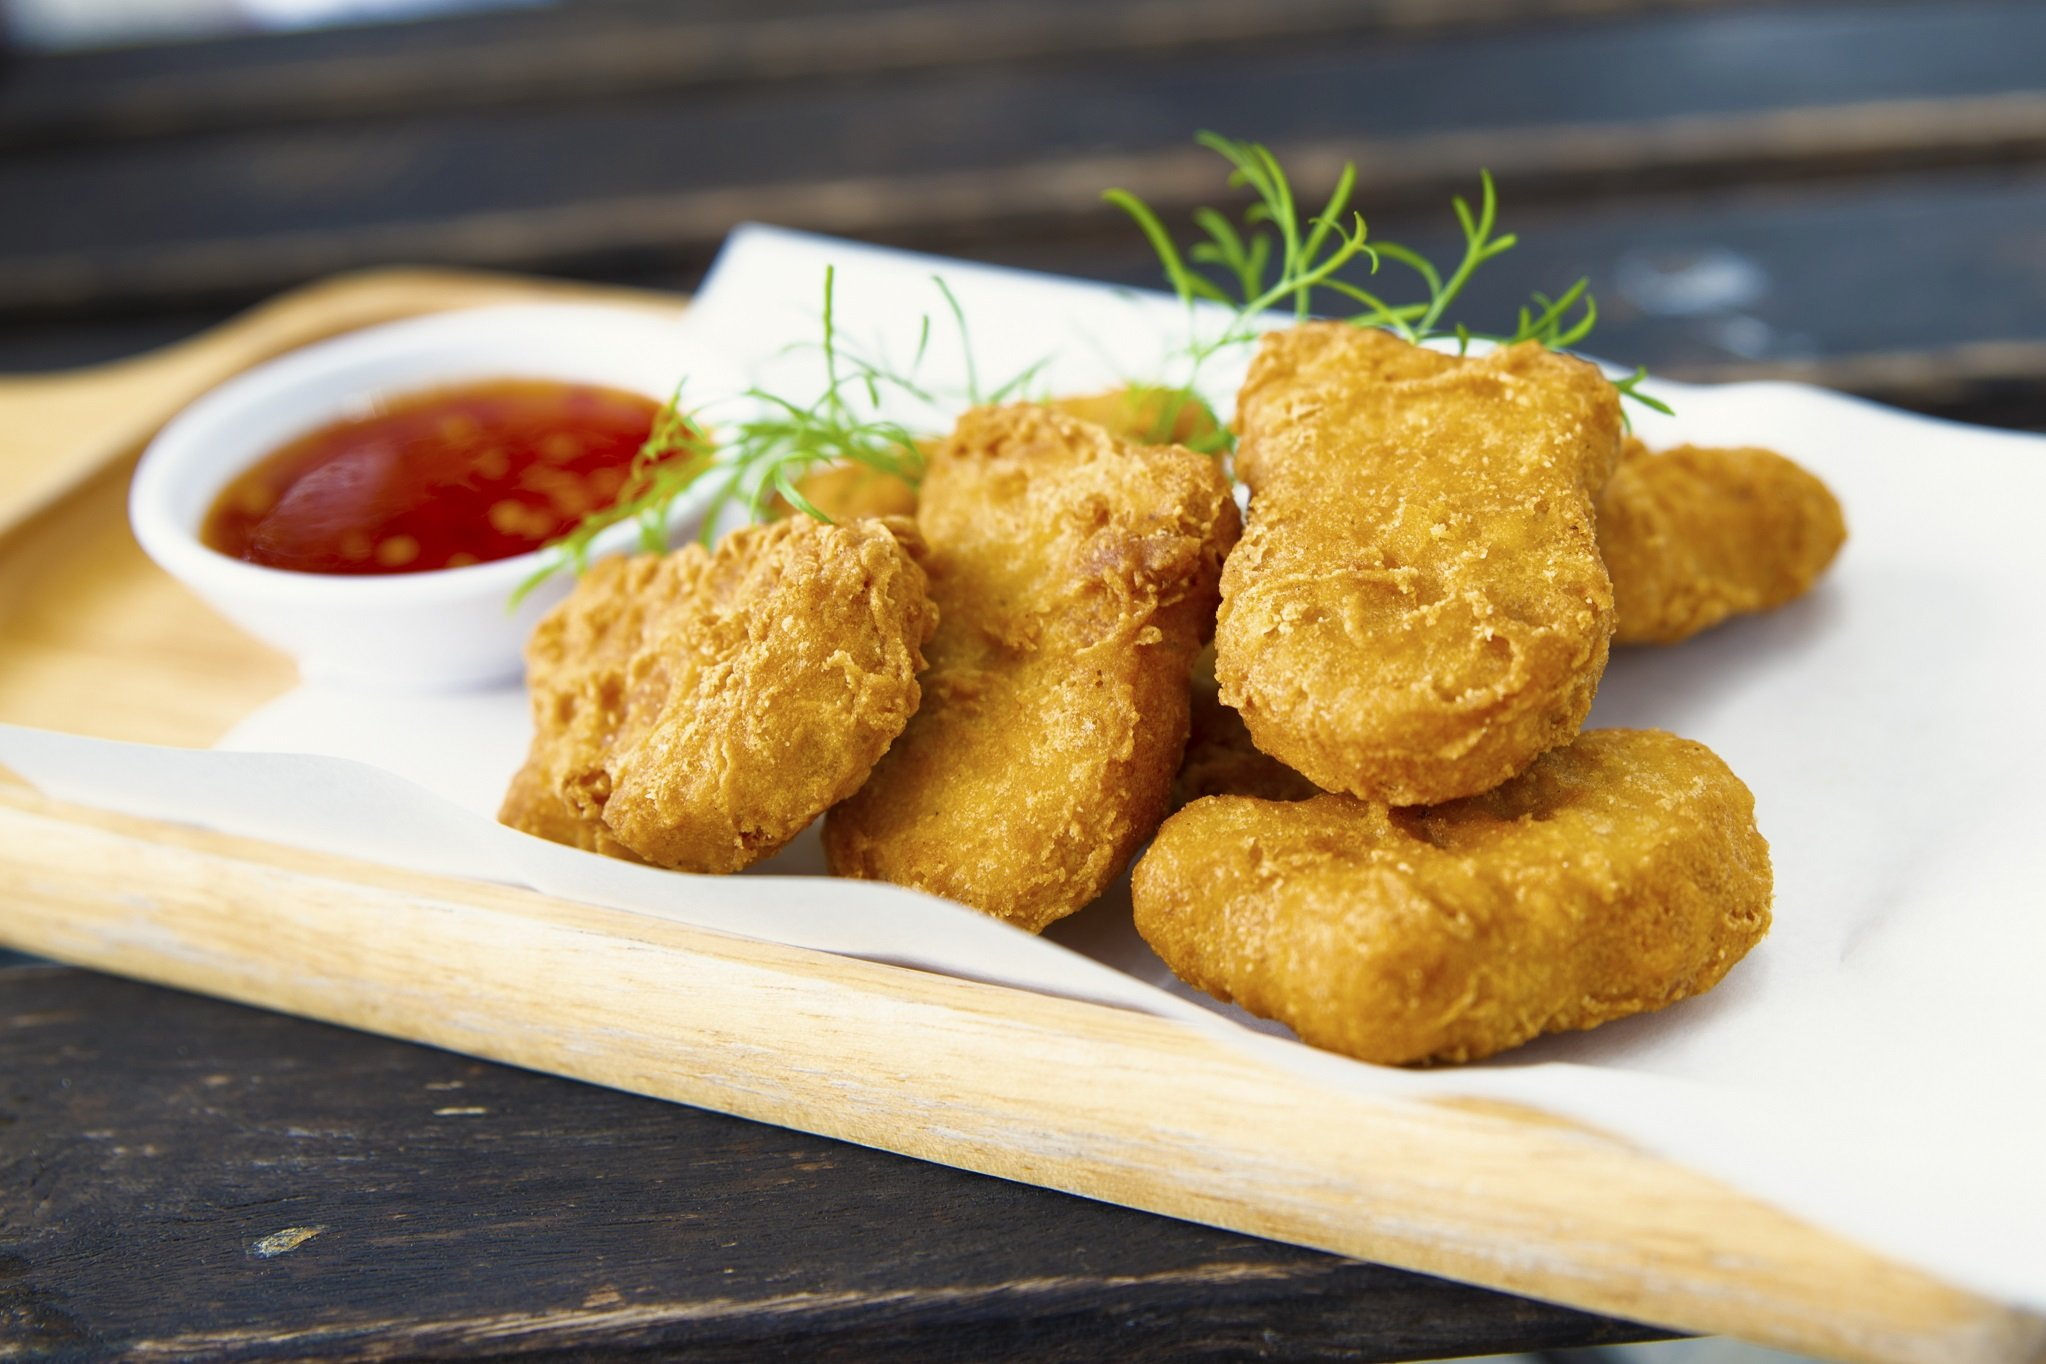 Homemade Chicken Nuggets photo